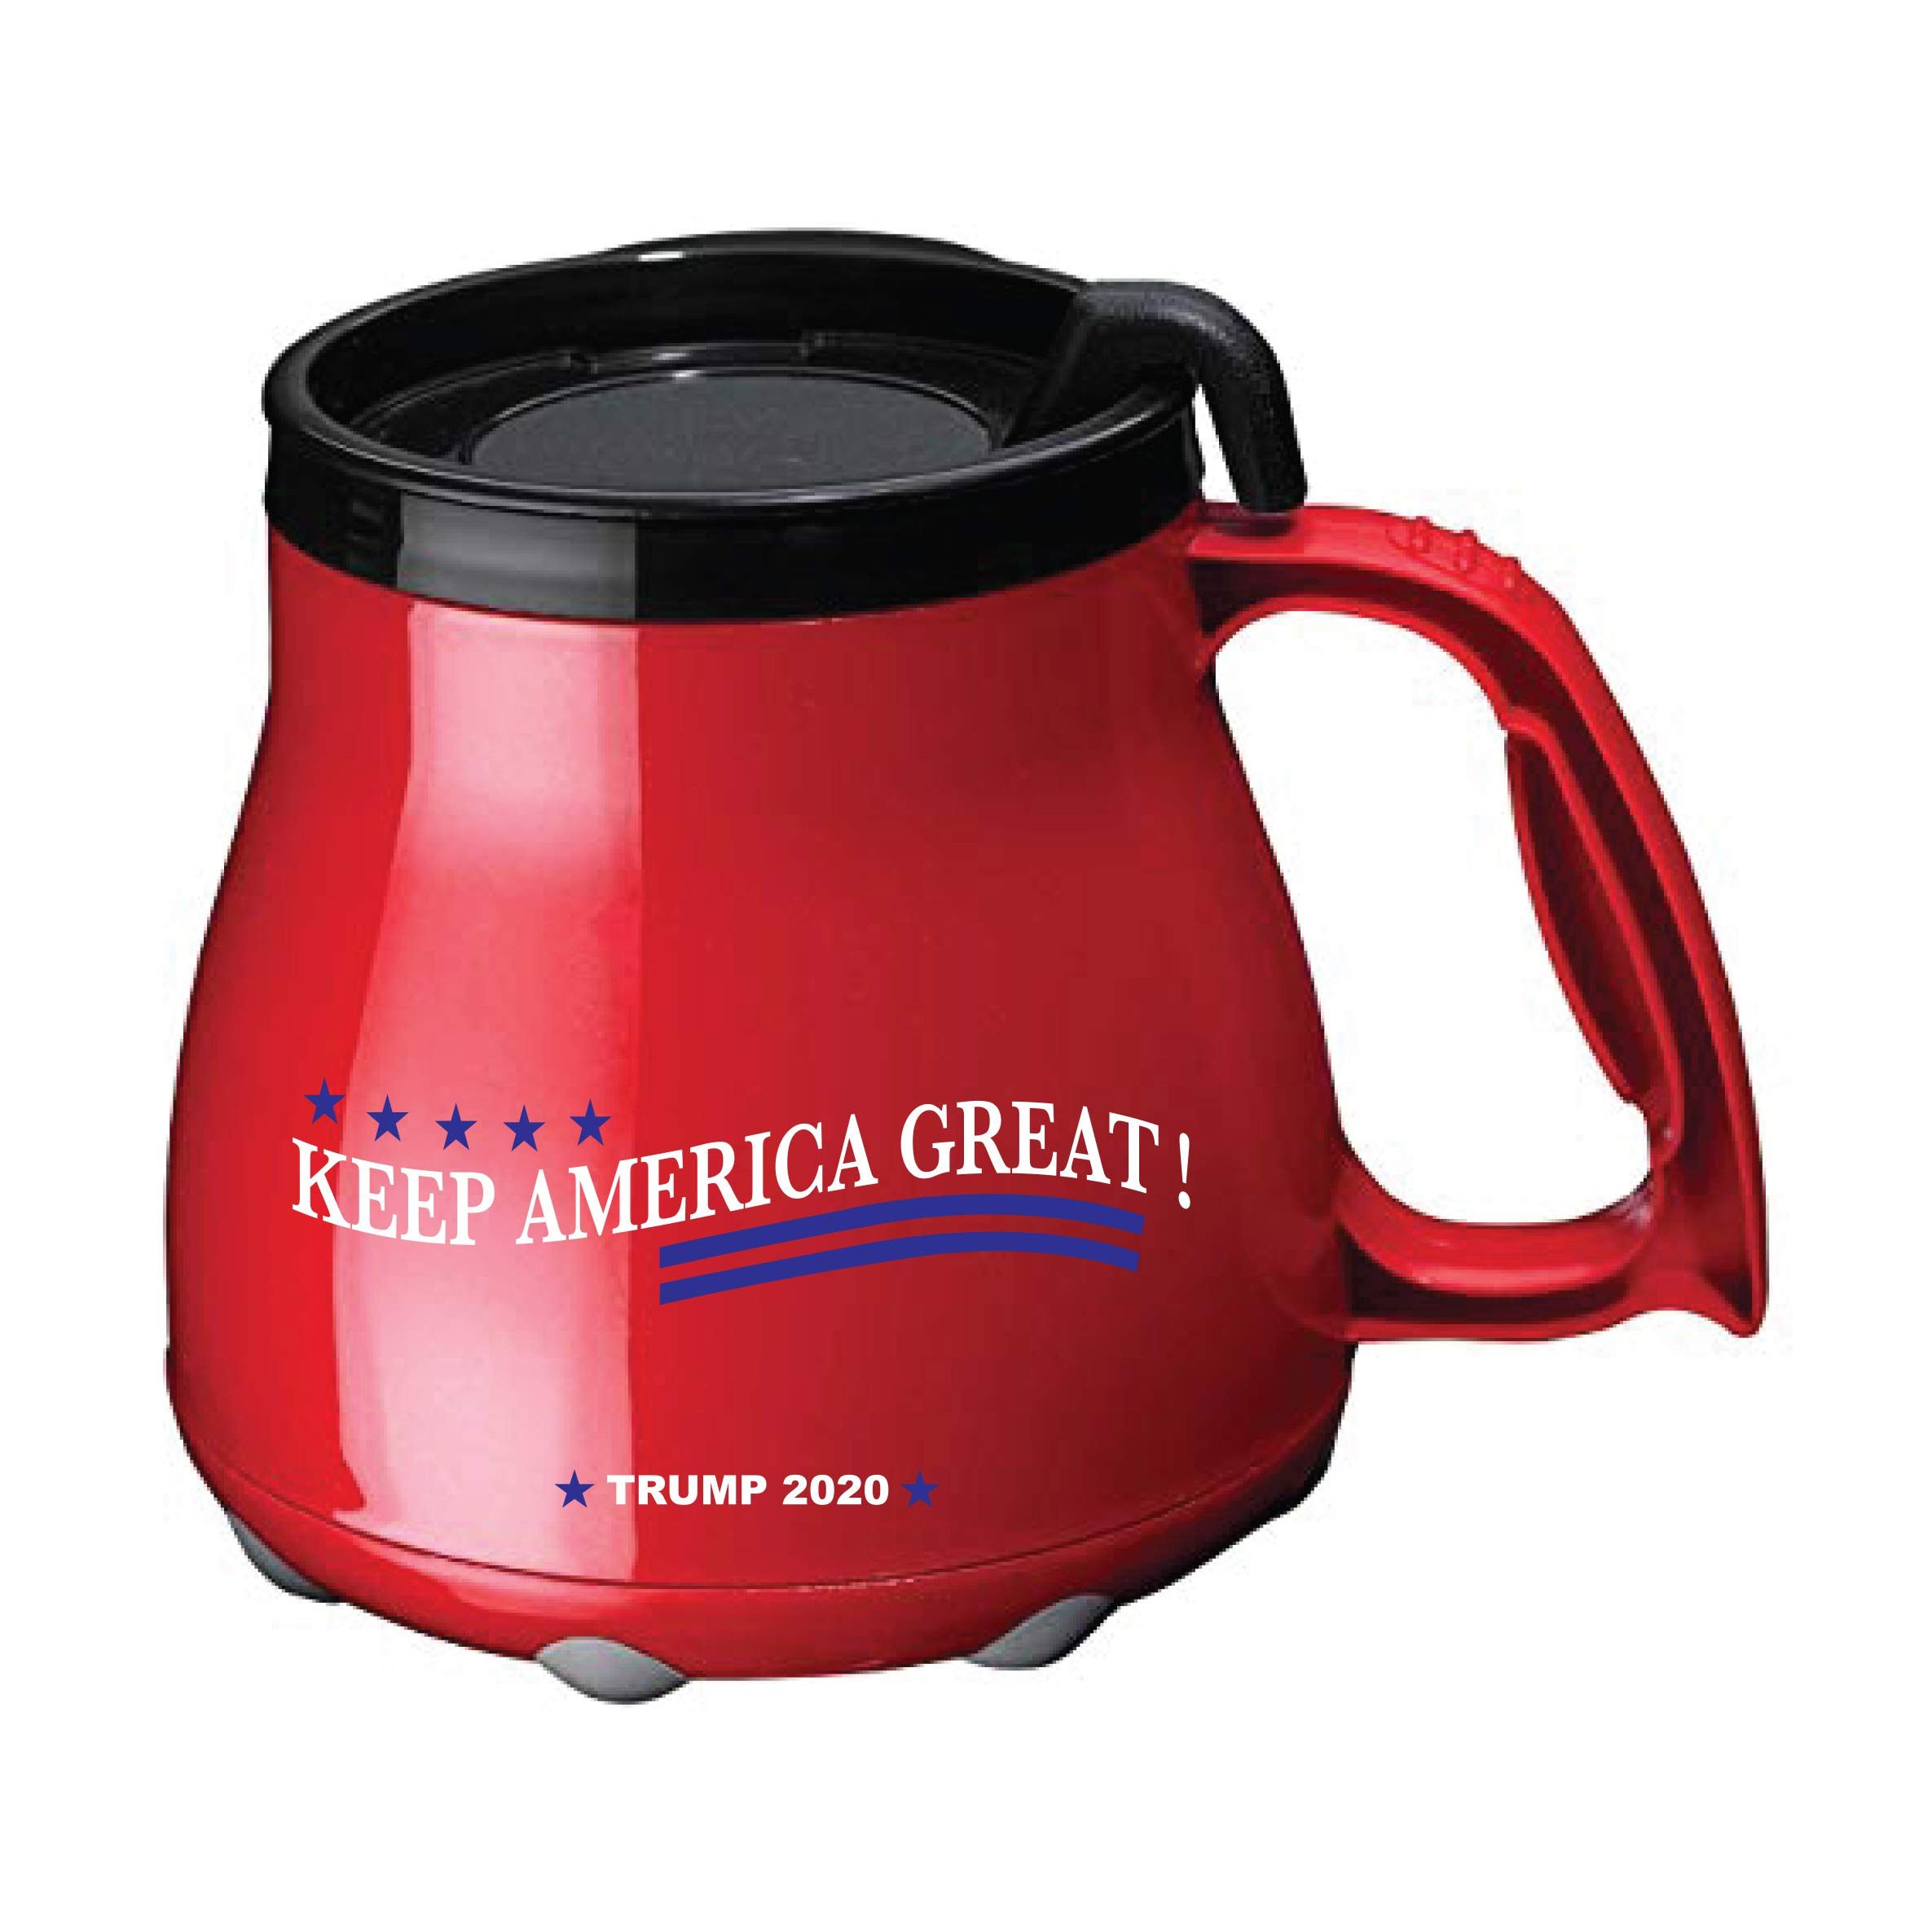 Low Rider insulated Mug 16oz Desk Mug Coffee Mug, Keep America Great ! (Red)